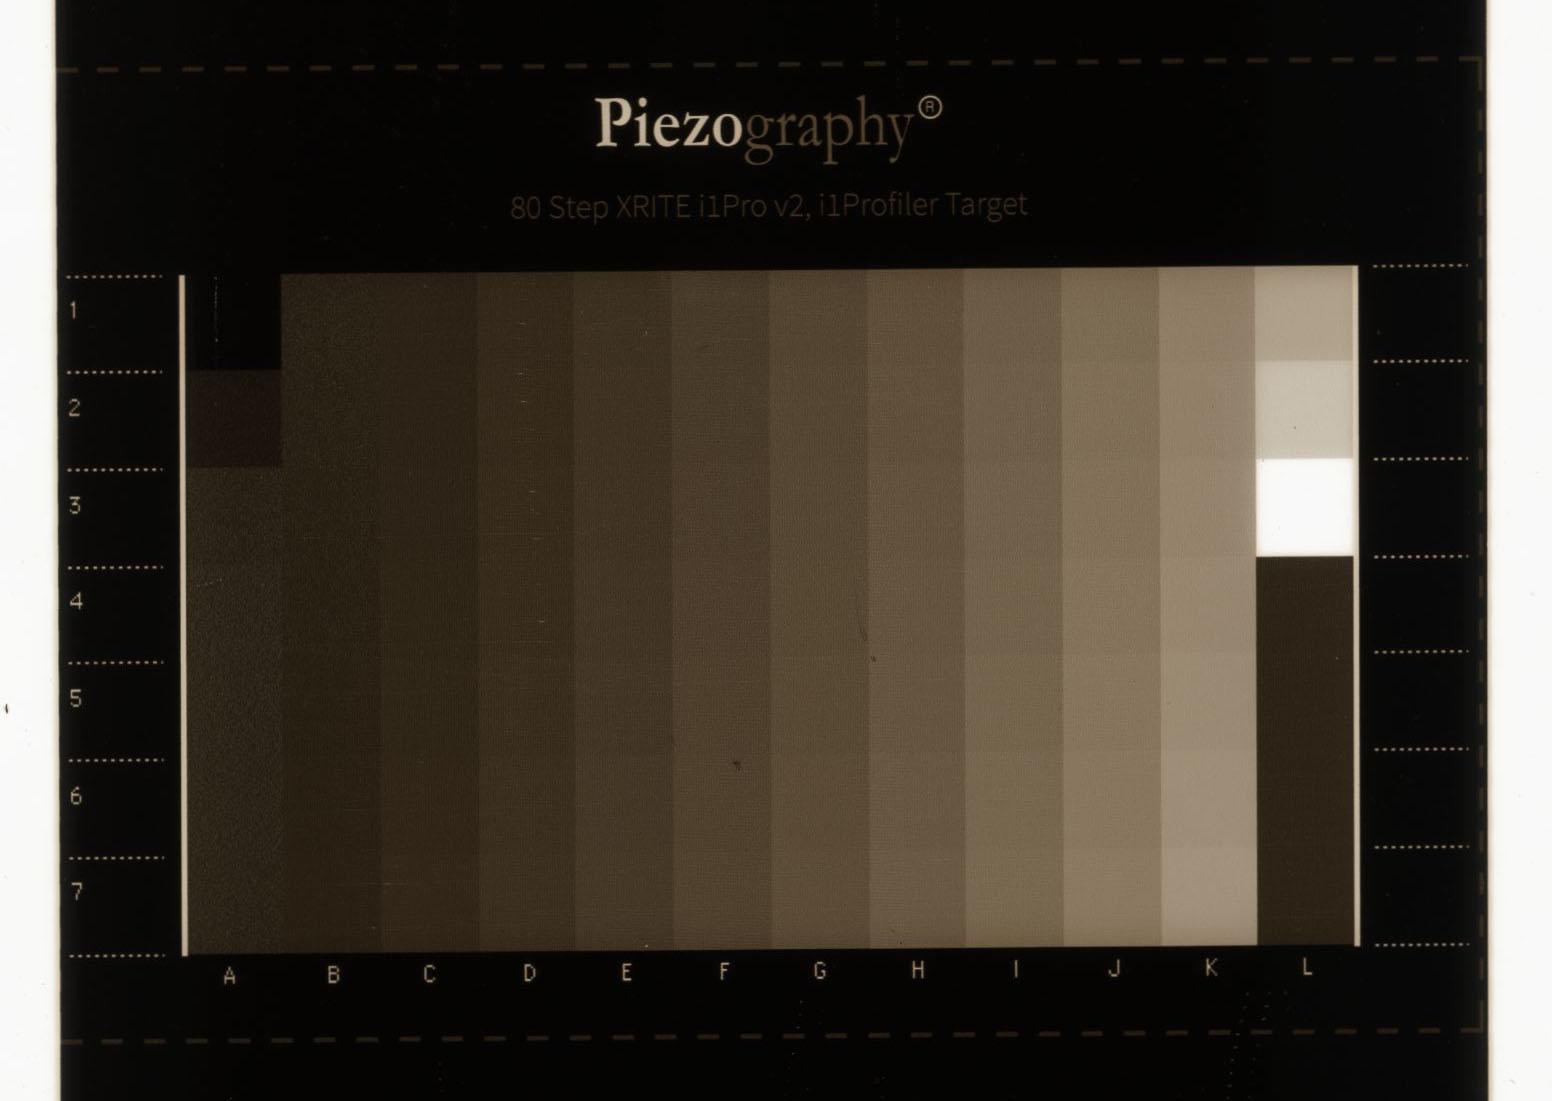 piezography_negative_step_11_15